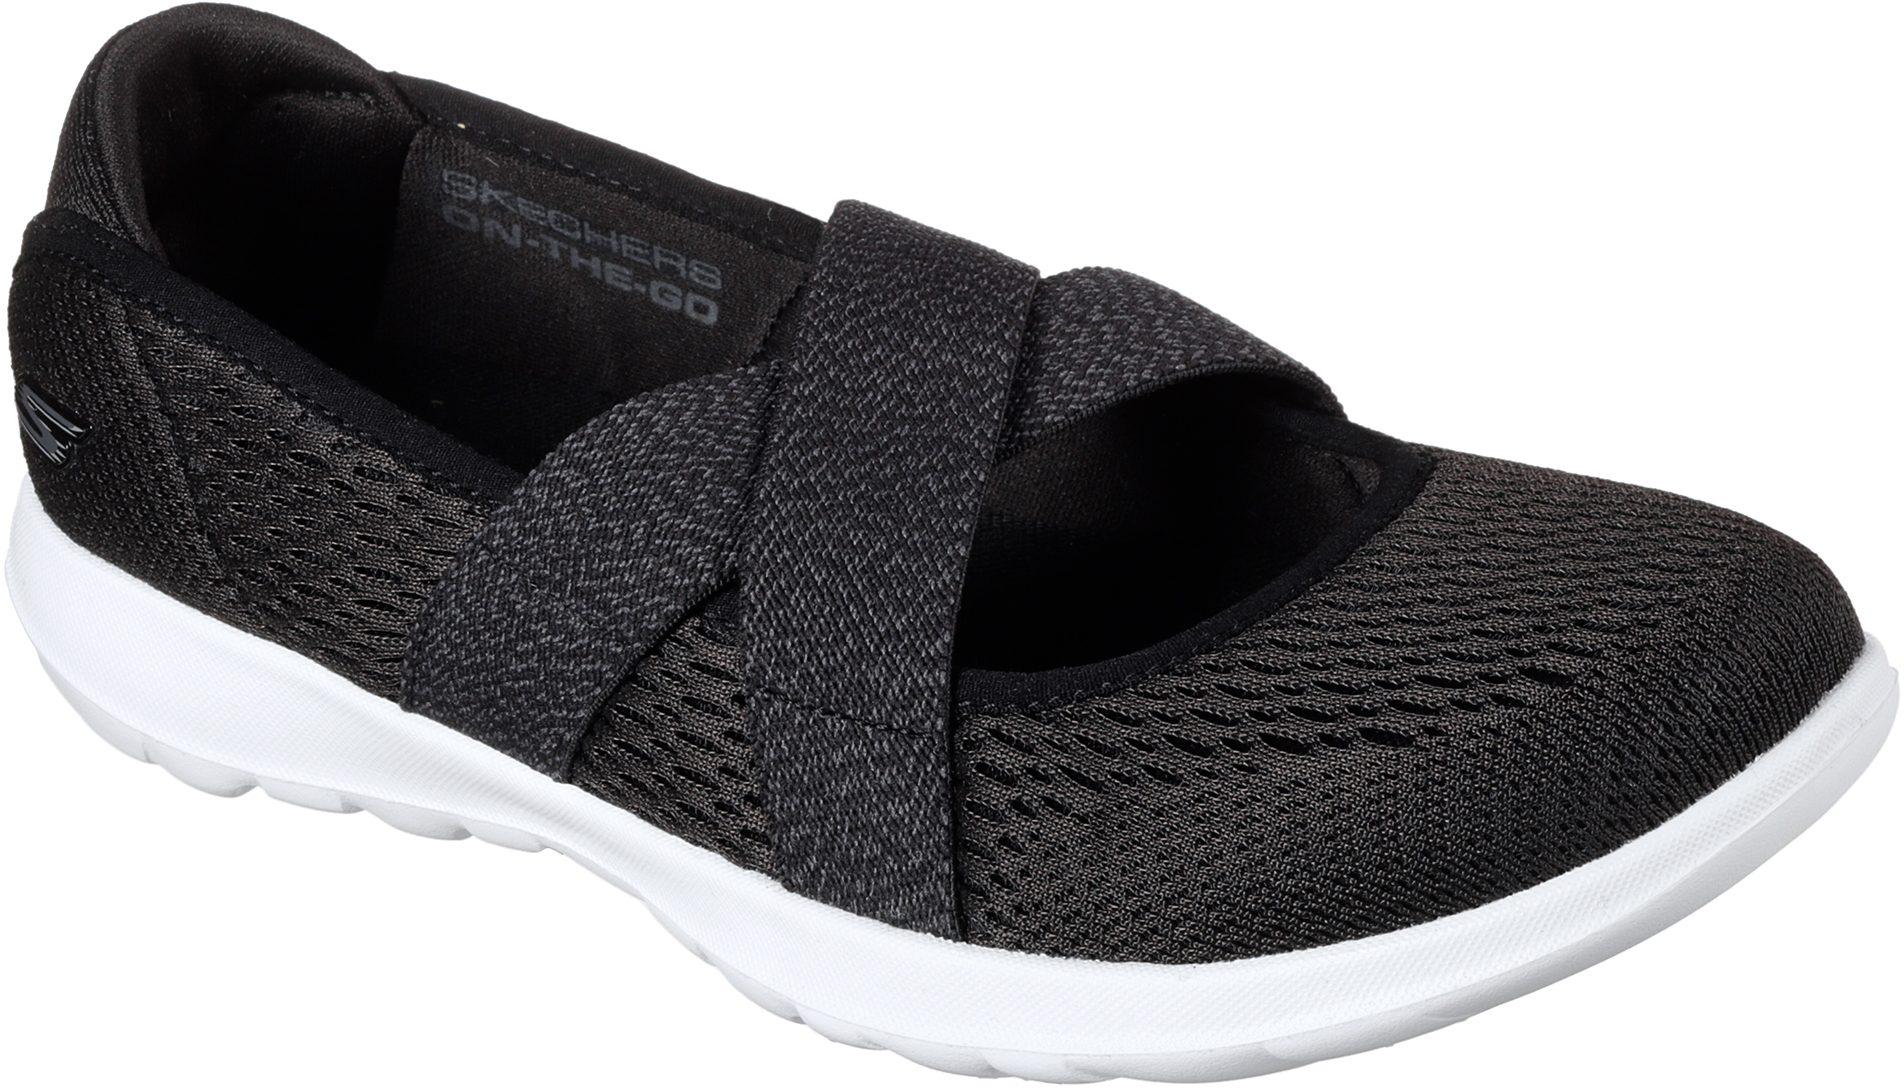 6a72e2249dd20 Skechers Go Walk Lite - Cutesy Black / White 15407 BKW - Womens Trainers -  Humphries Shoes